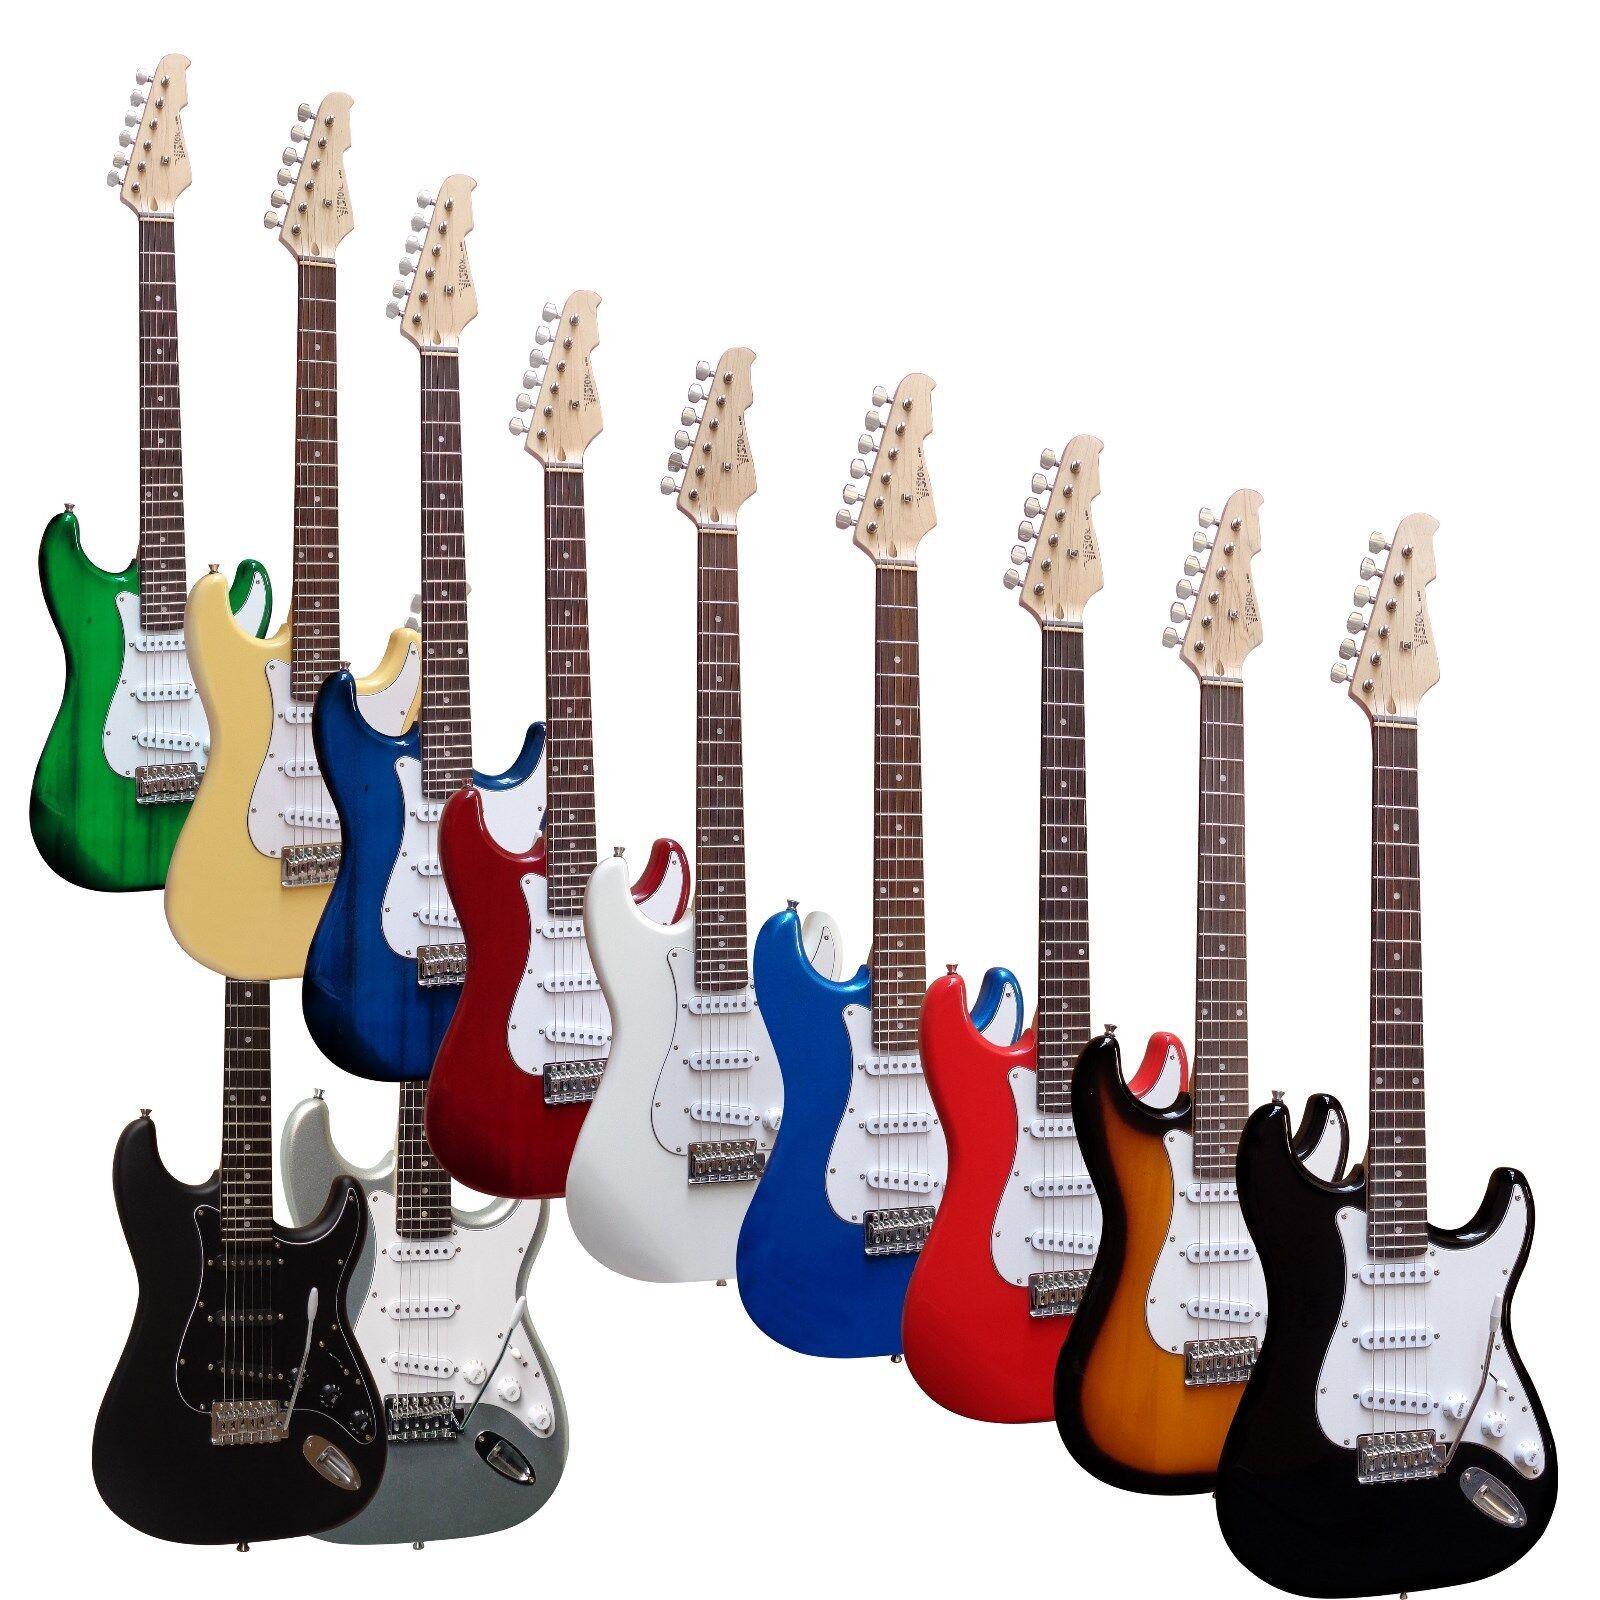 E-Gitarre MSA-ST5 schwarz, Massivholzkörper, Top AUSWAHL, mit Anschlußkabel n